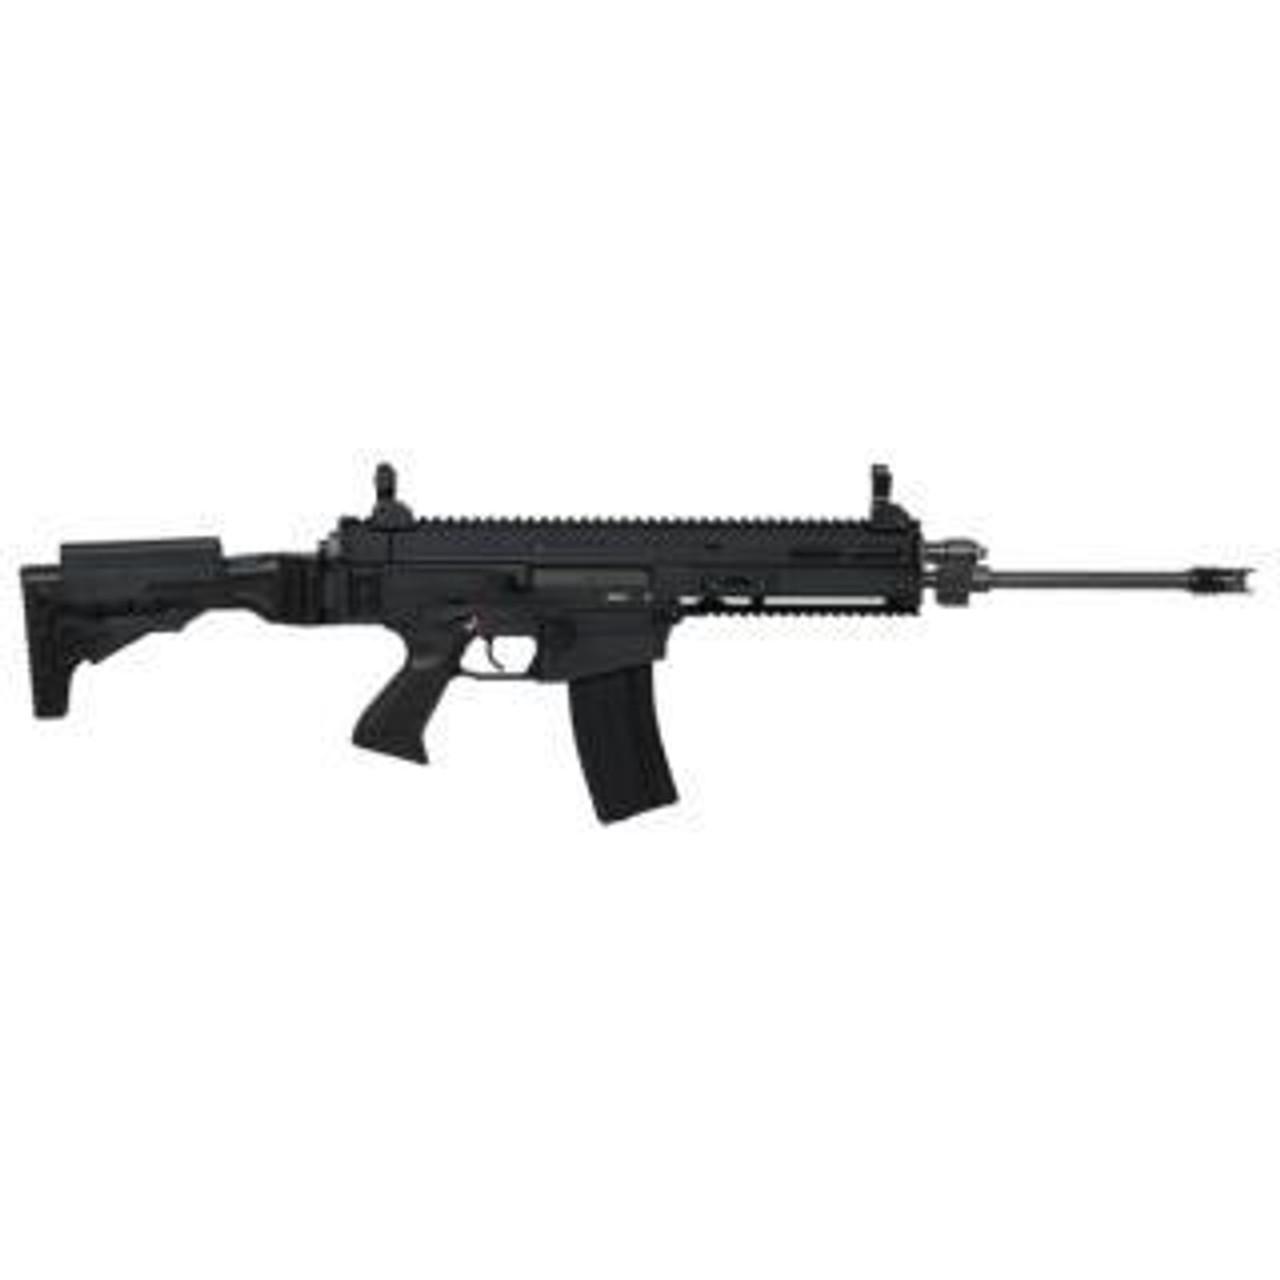 CZ Bren 805 Carbine CALIFORNIA LEGAL - .223/5.56- Black